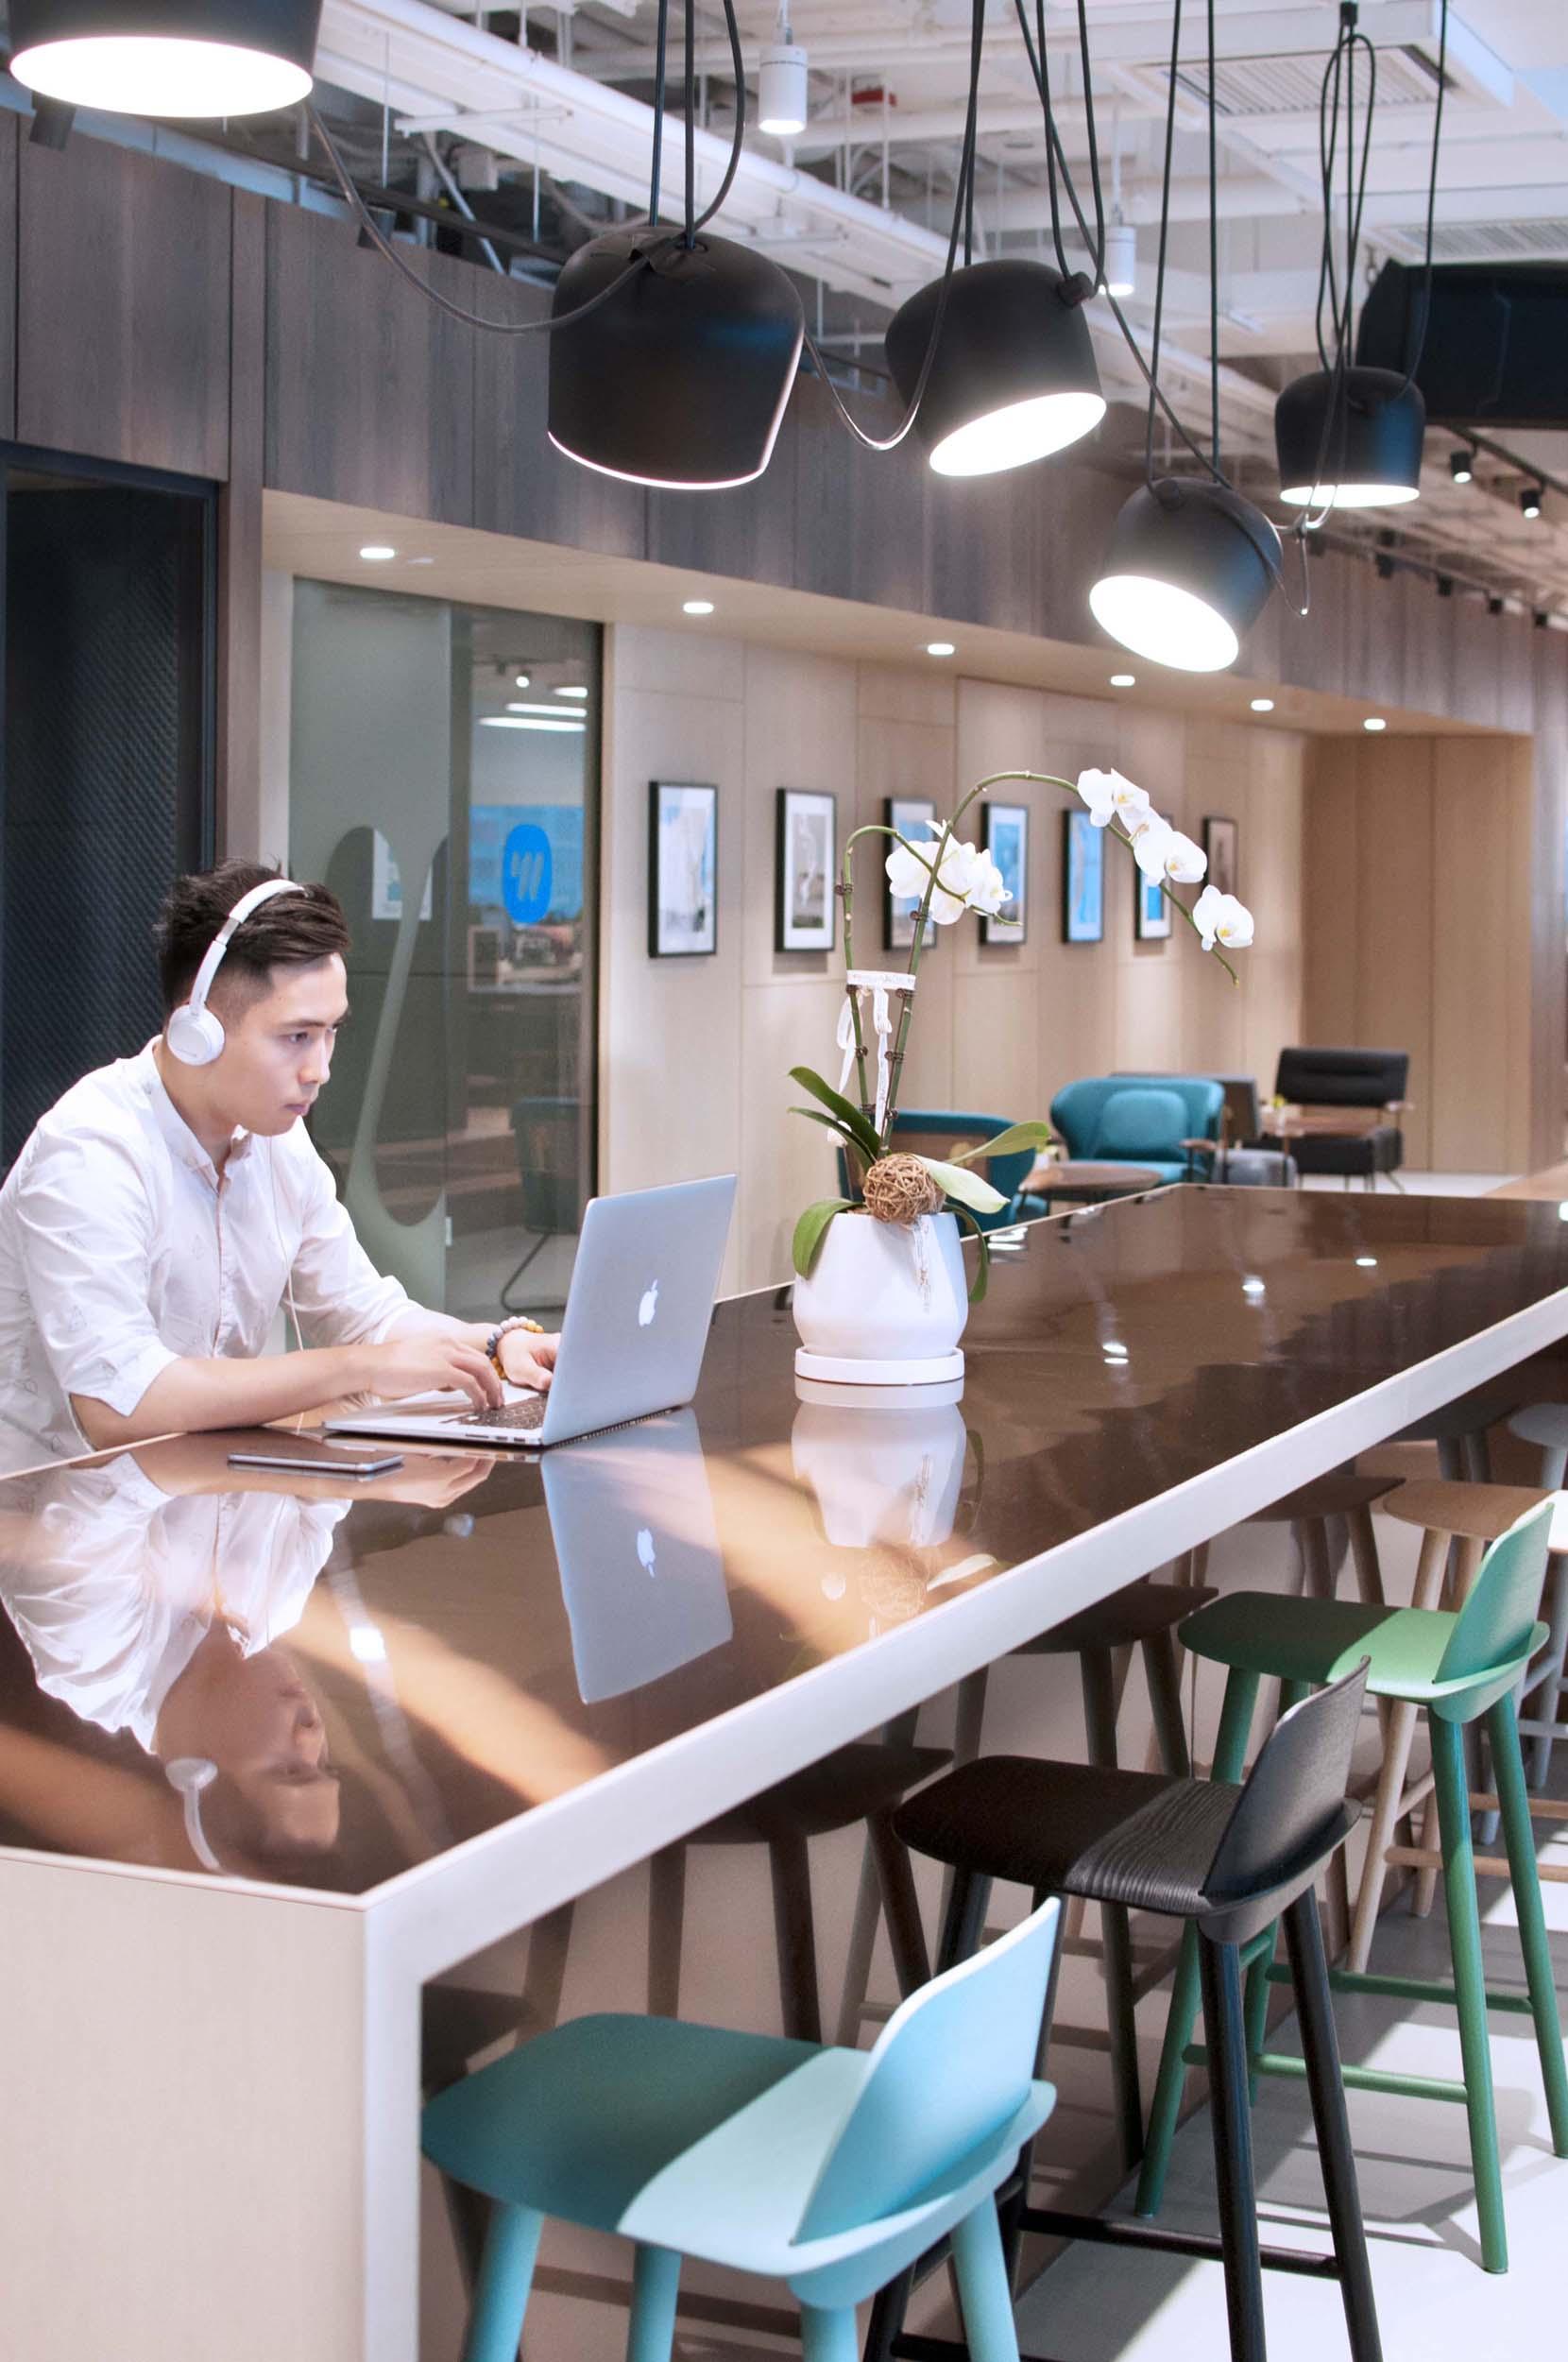 07_Bean Buro_Office Workplace_Kwung Tong_Warner Music Hong Kong.jpg